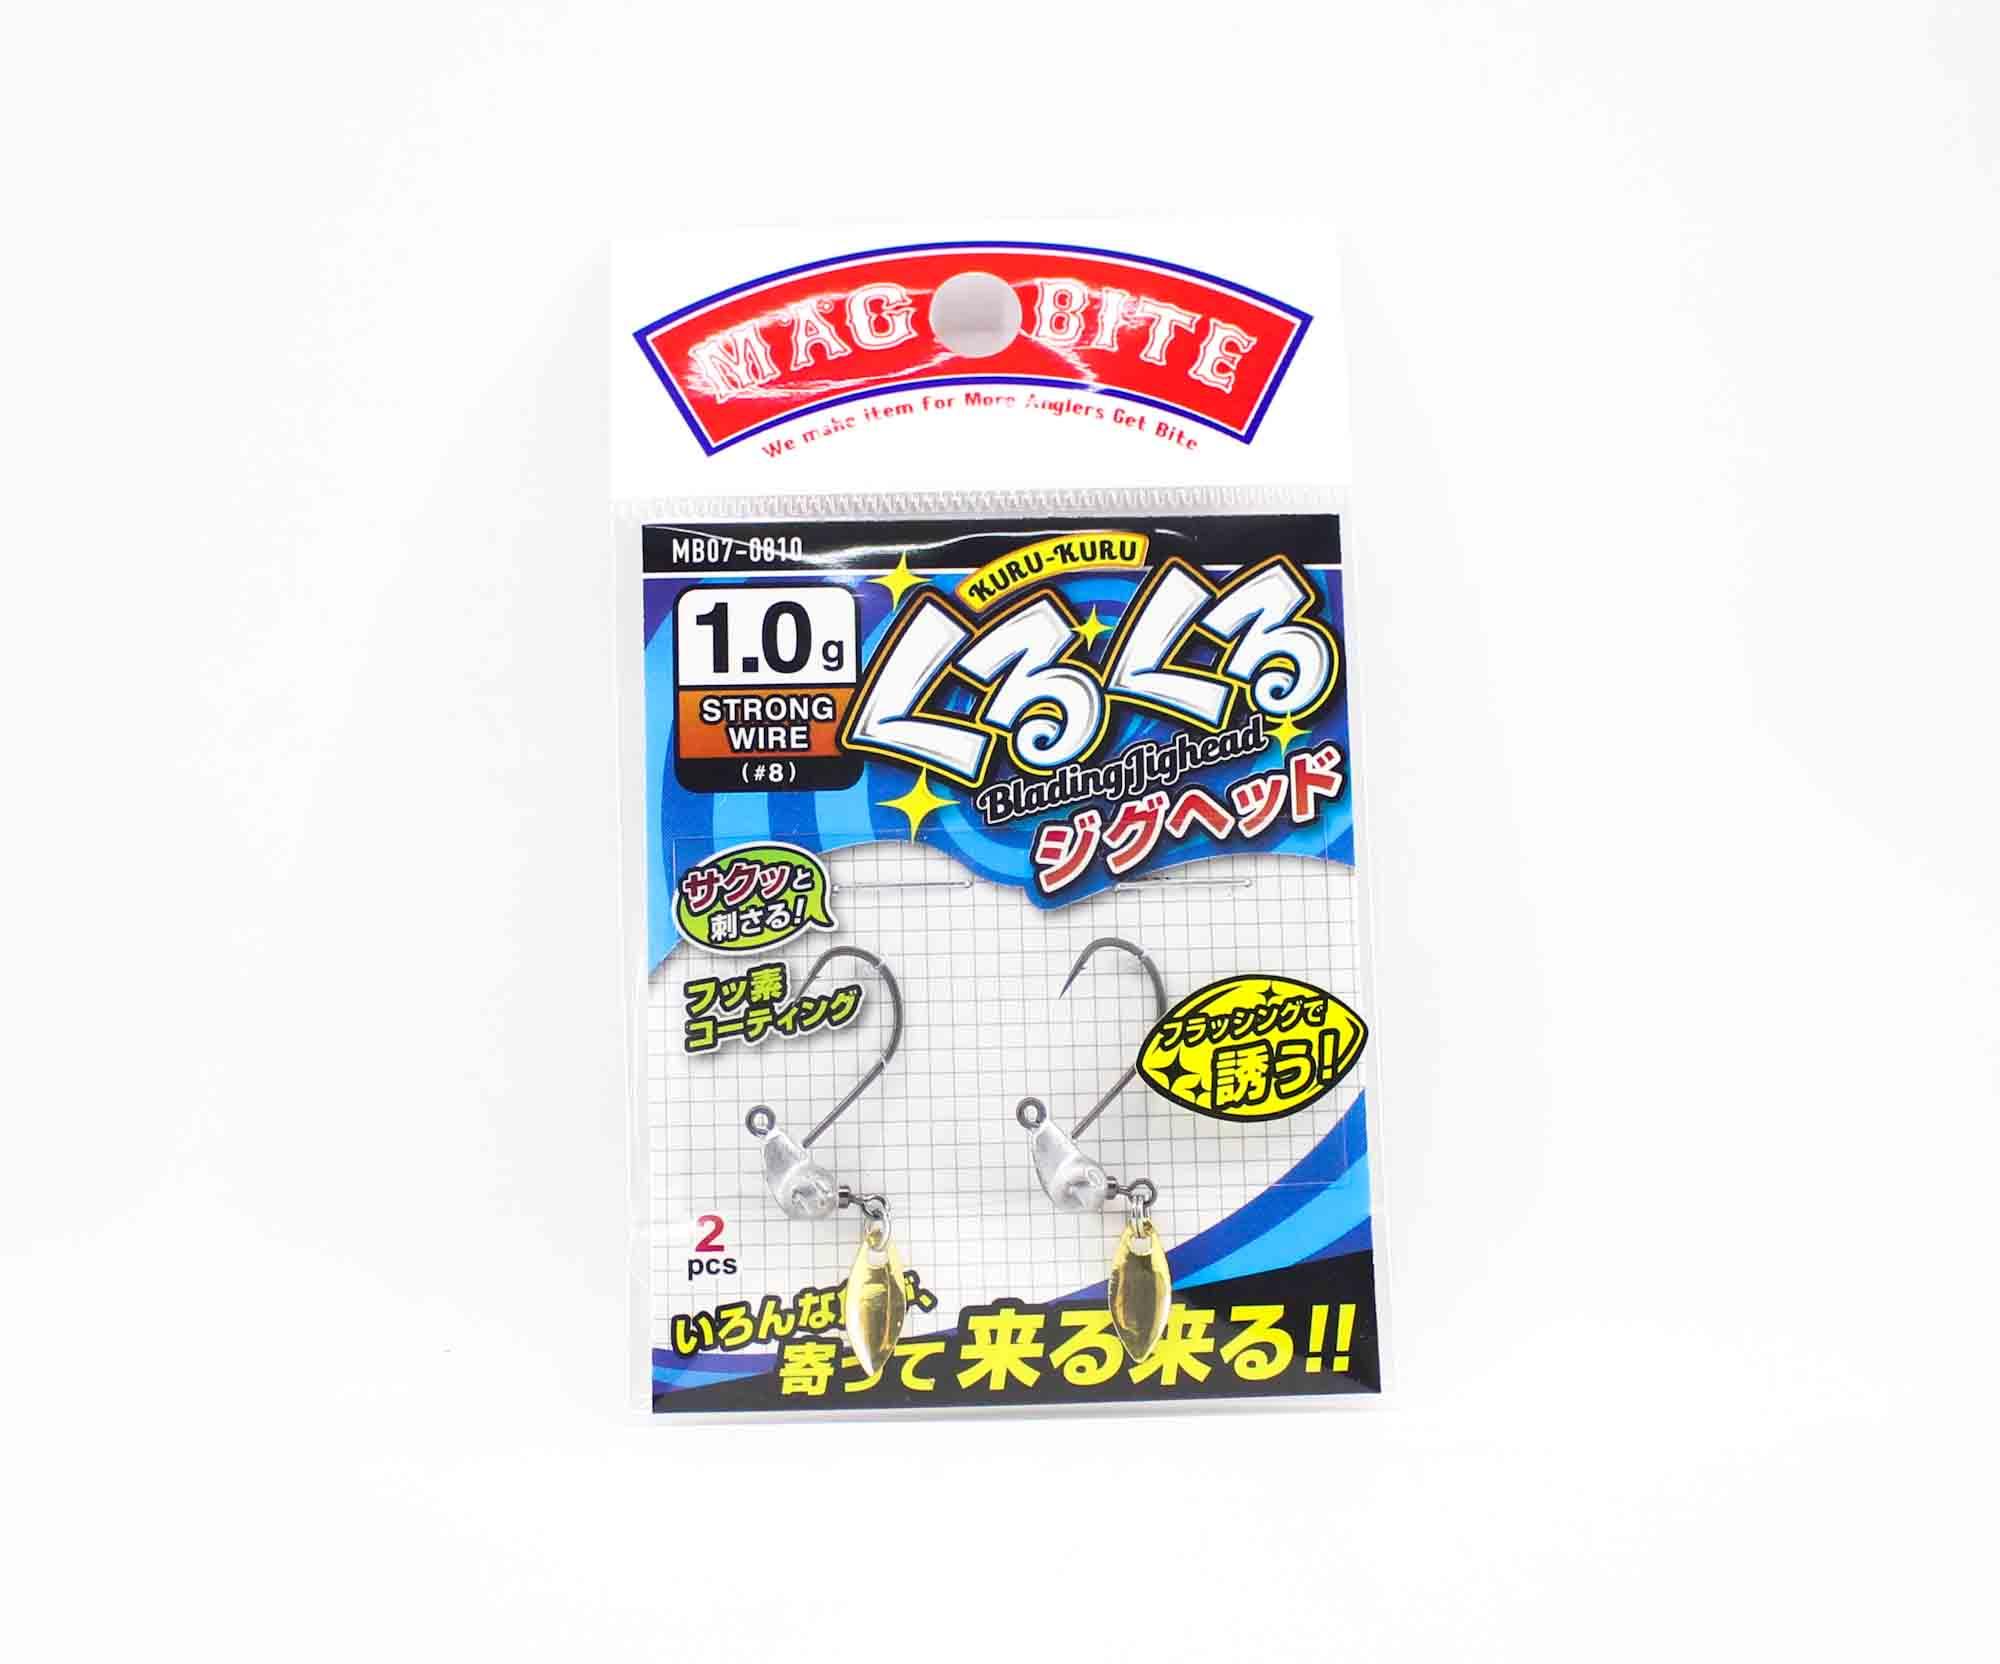 Harimitsu Mag bite Jighead KuruKuru Blading 1 grams size 8 (7031)